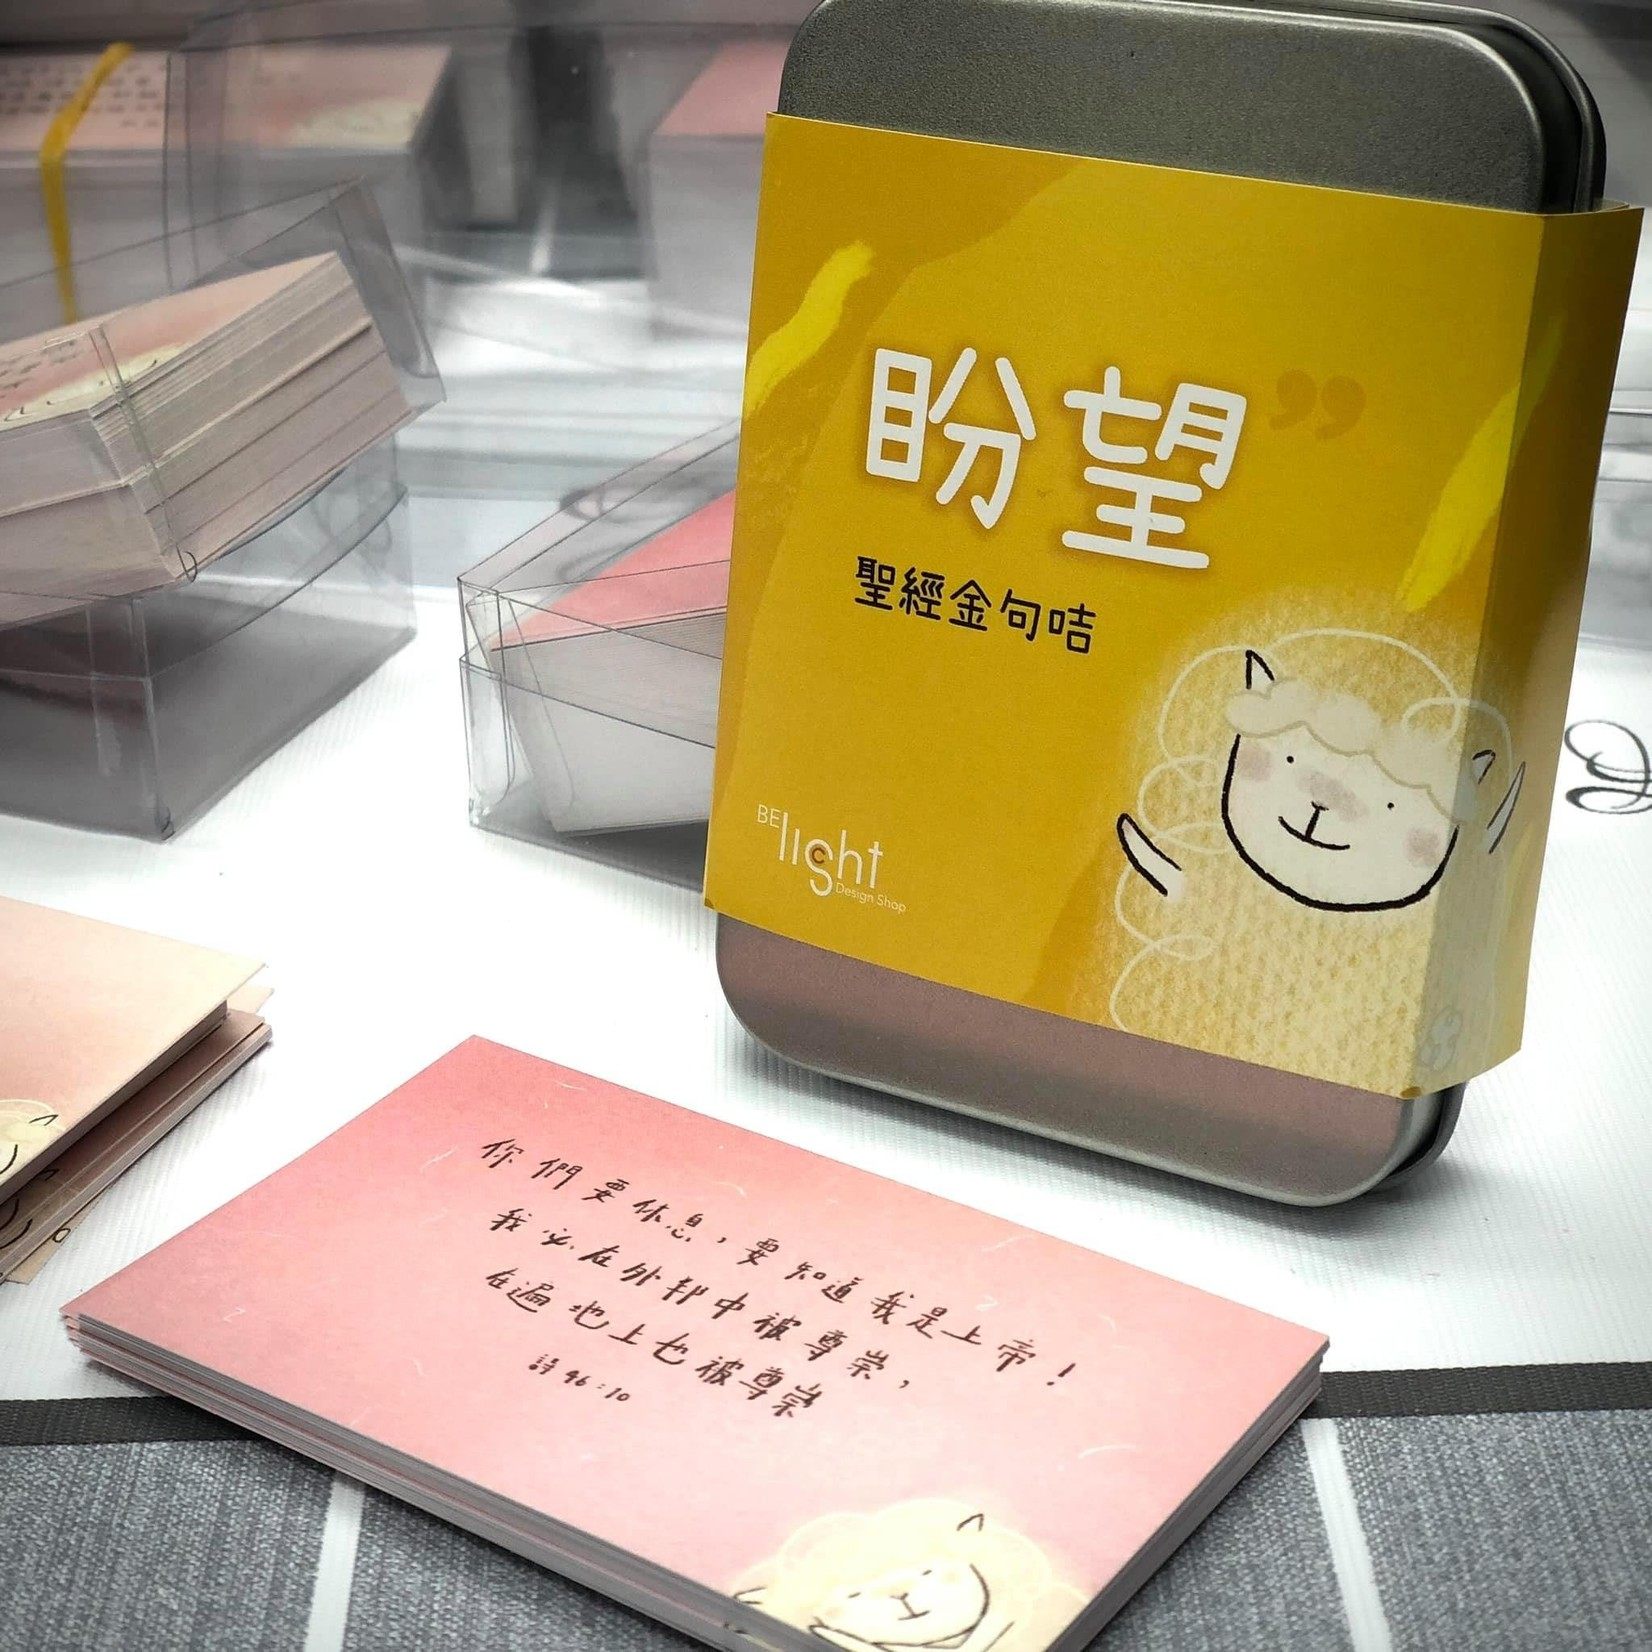 Belight Design Limited 盼望:聖經金句卡(12 款 24 張)